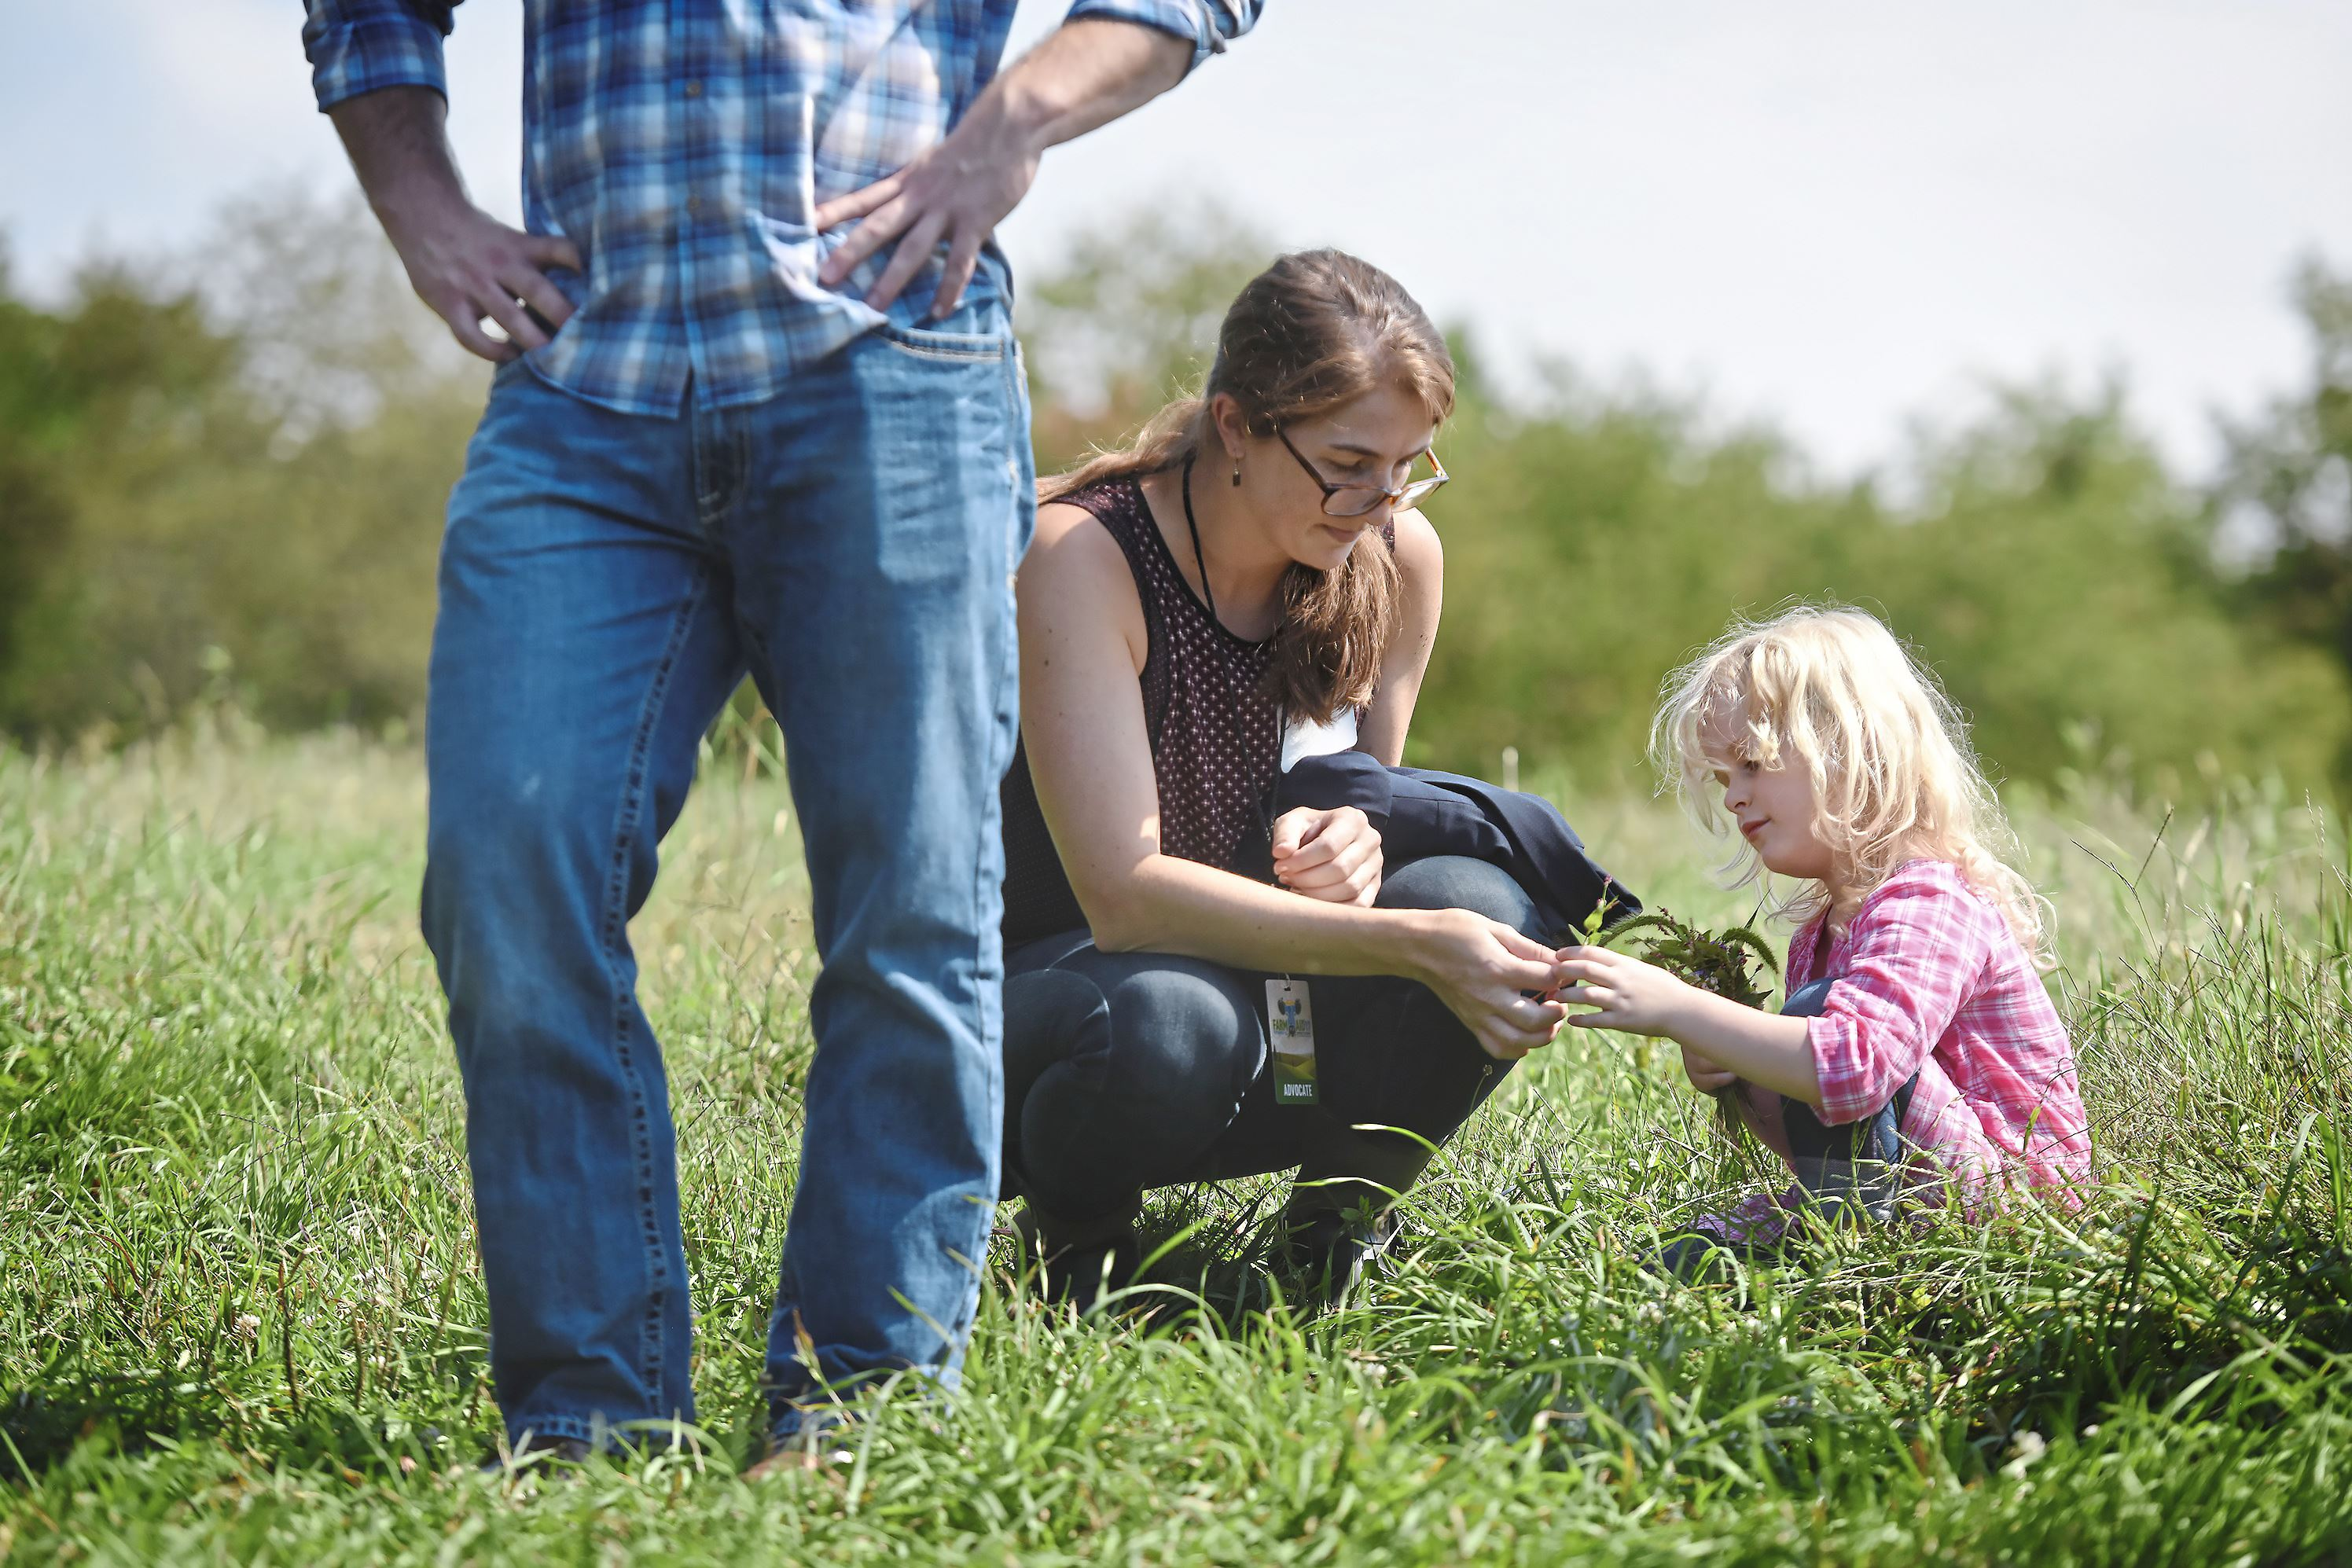 20170915smFarmAid001 Teryn Adkins, 5, shows a plant to Sarah Buranskas during a tour Friday of Kretschmann Organic Farm near Zelienople.